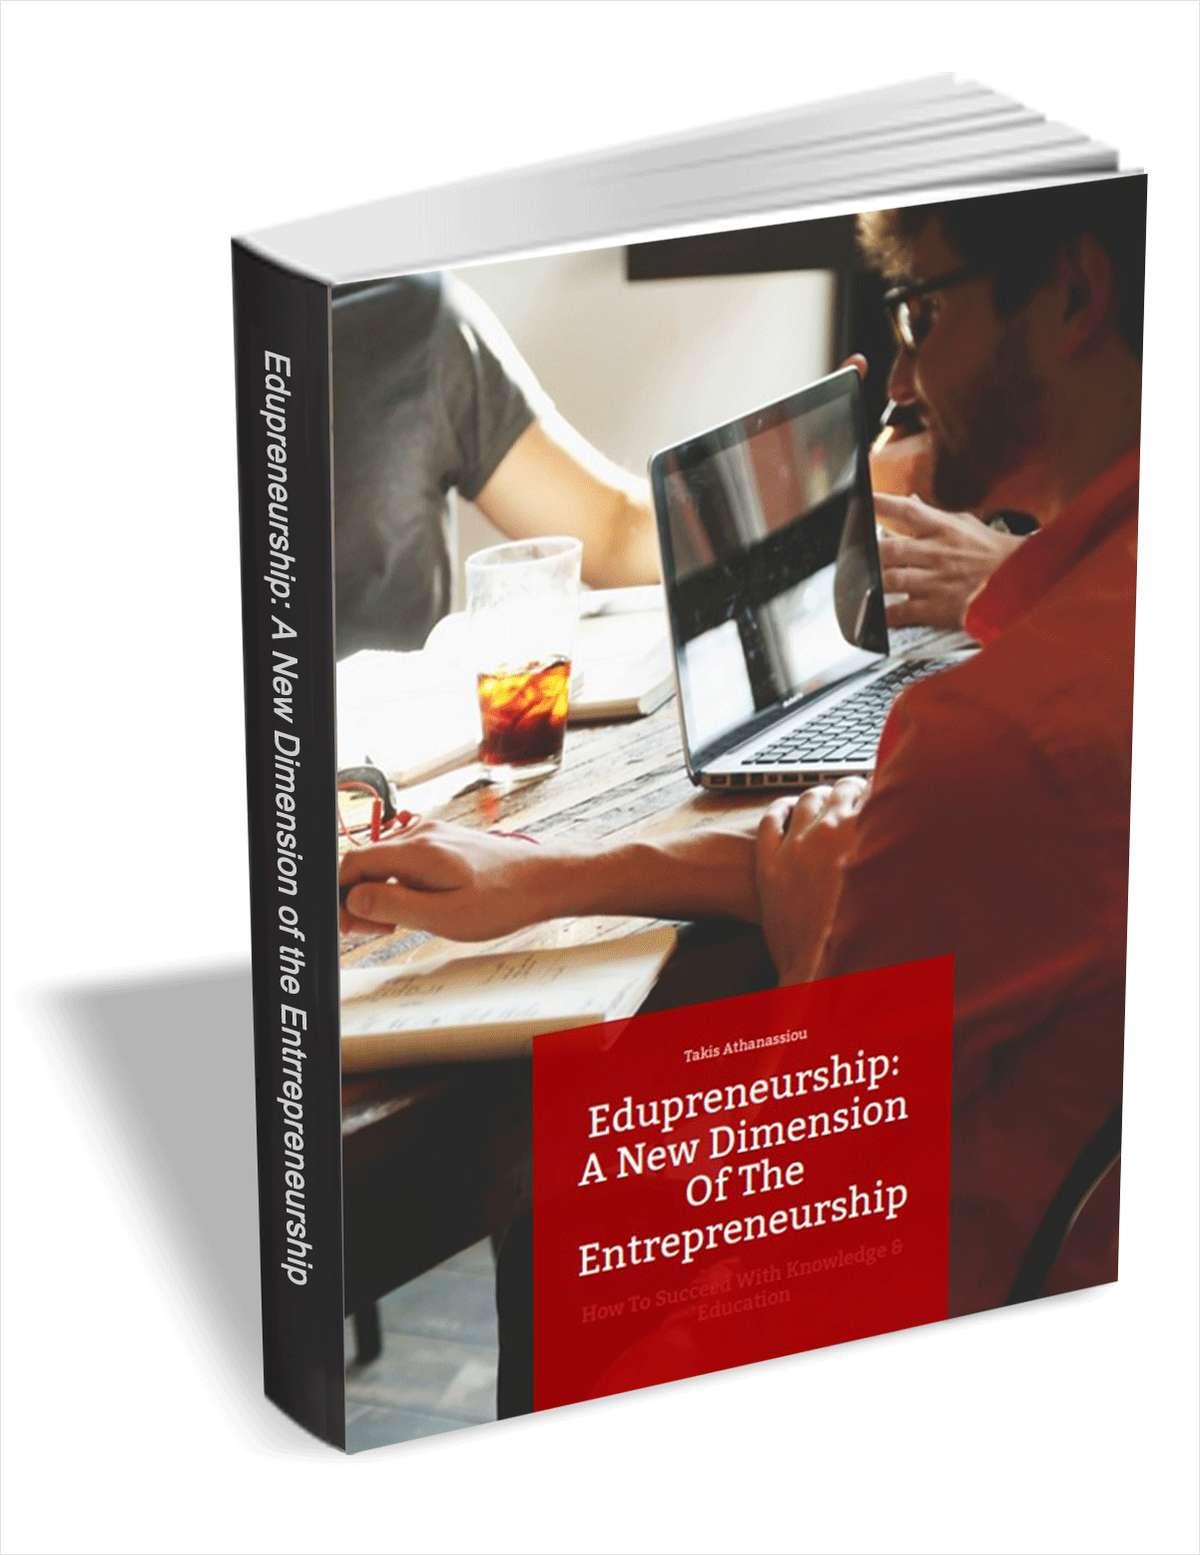 Edupreneurship - A New Dimension of the Entrepreneurship